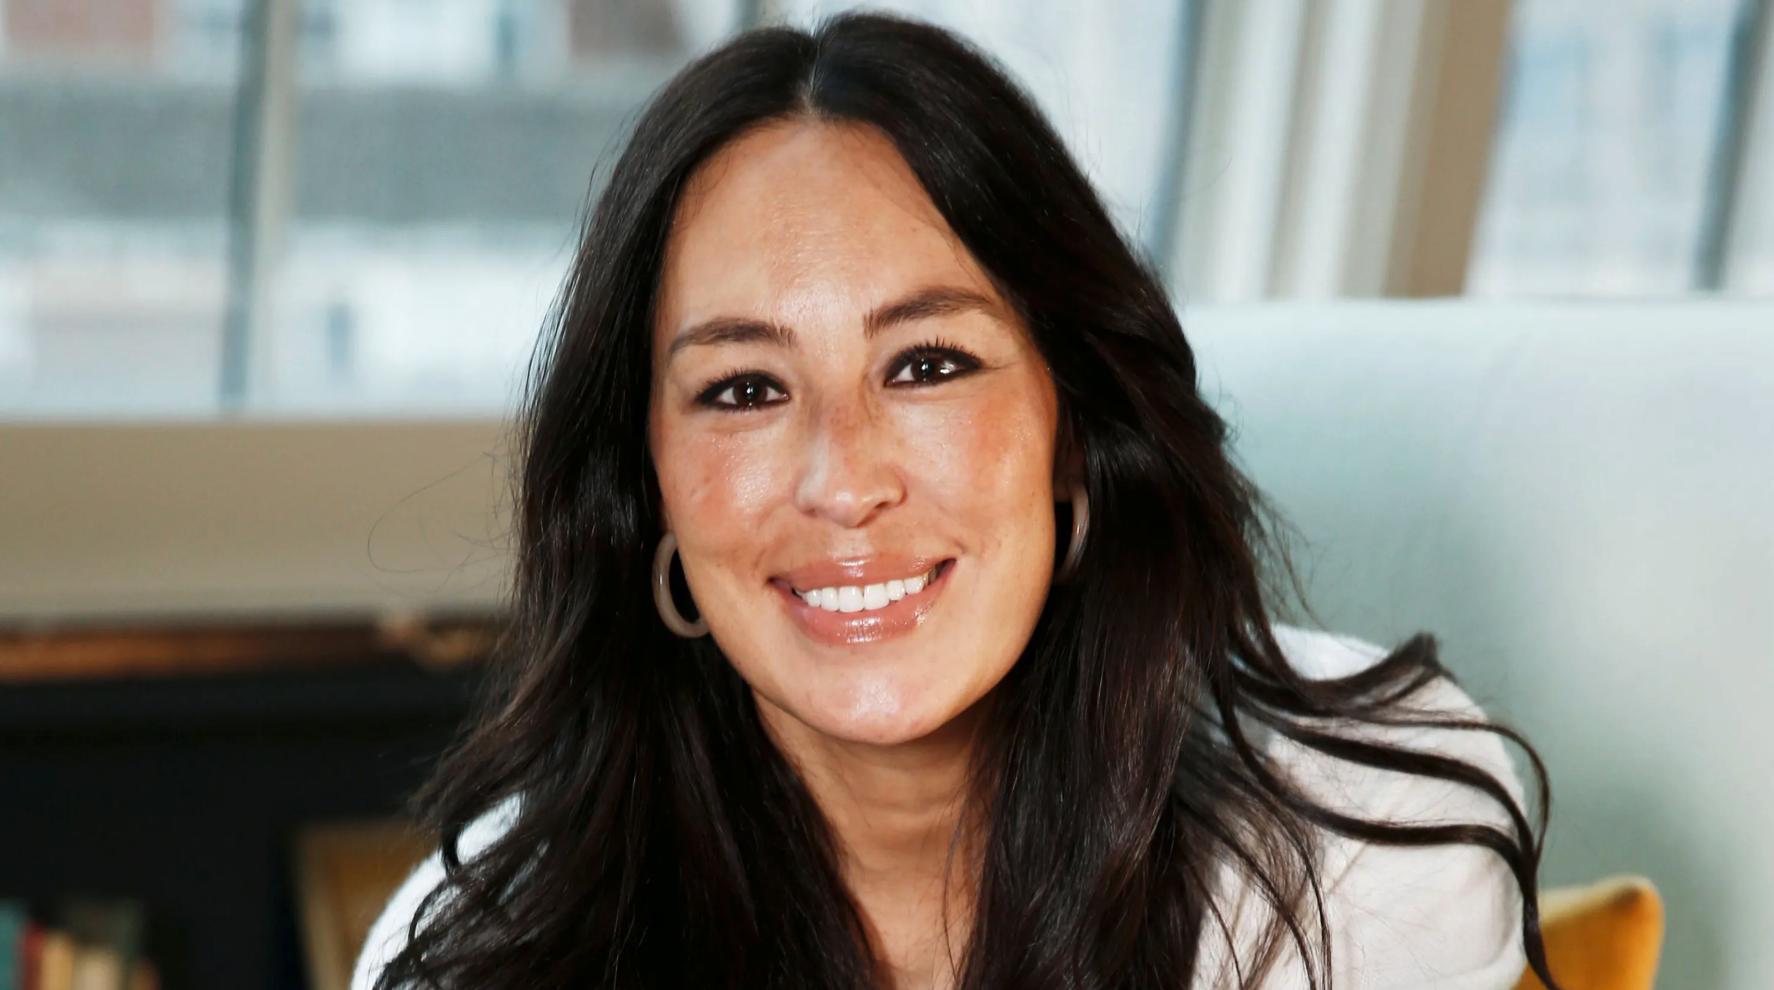 Joanna Gaines